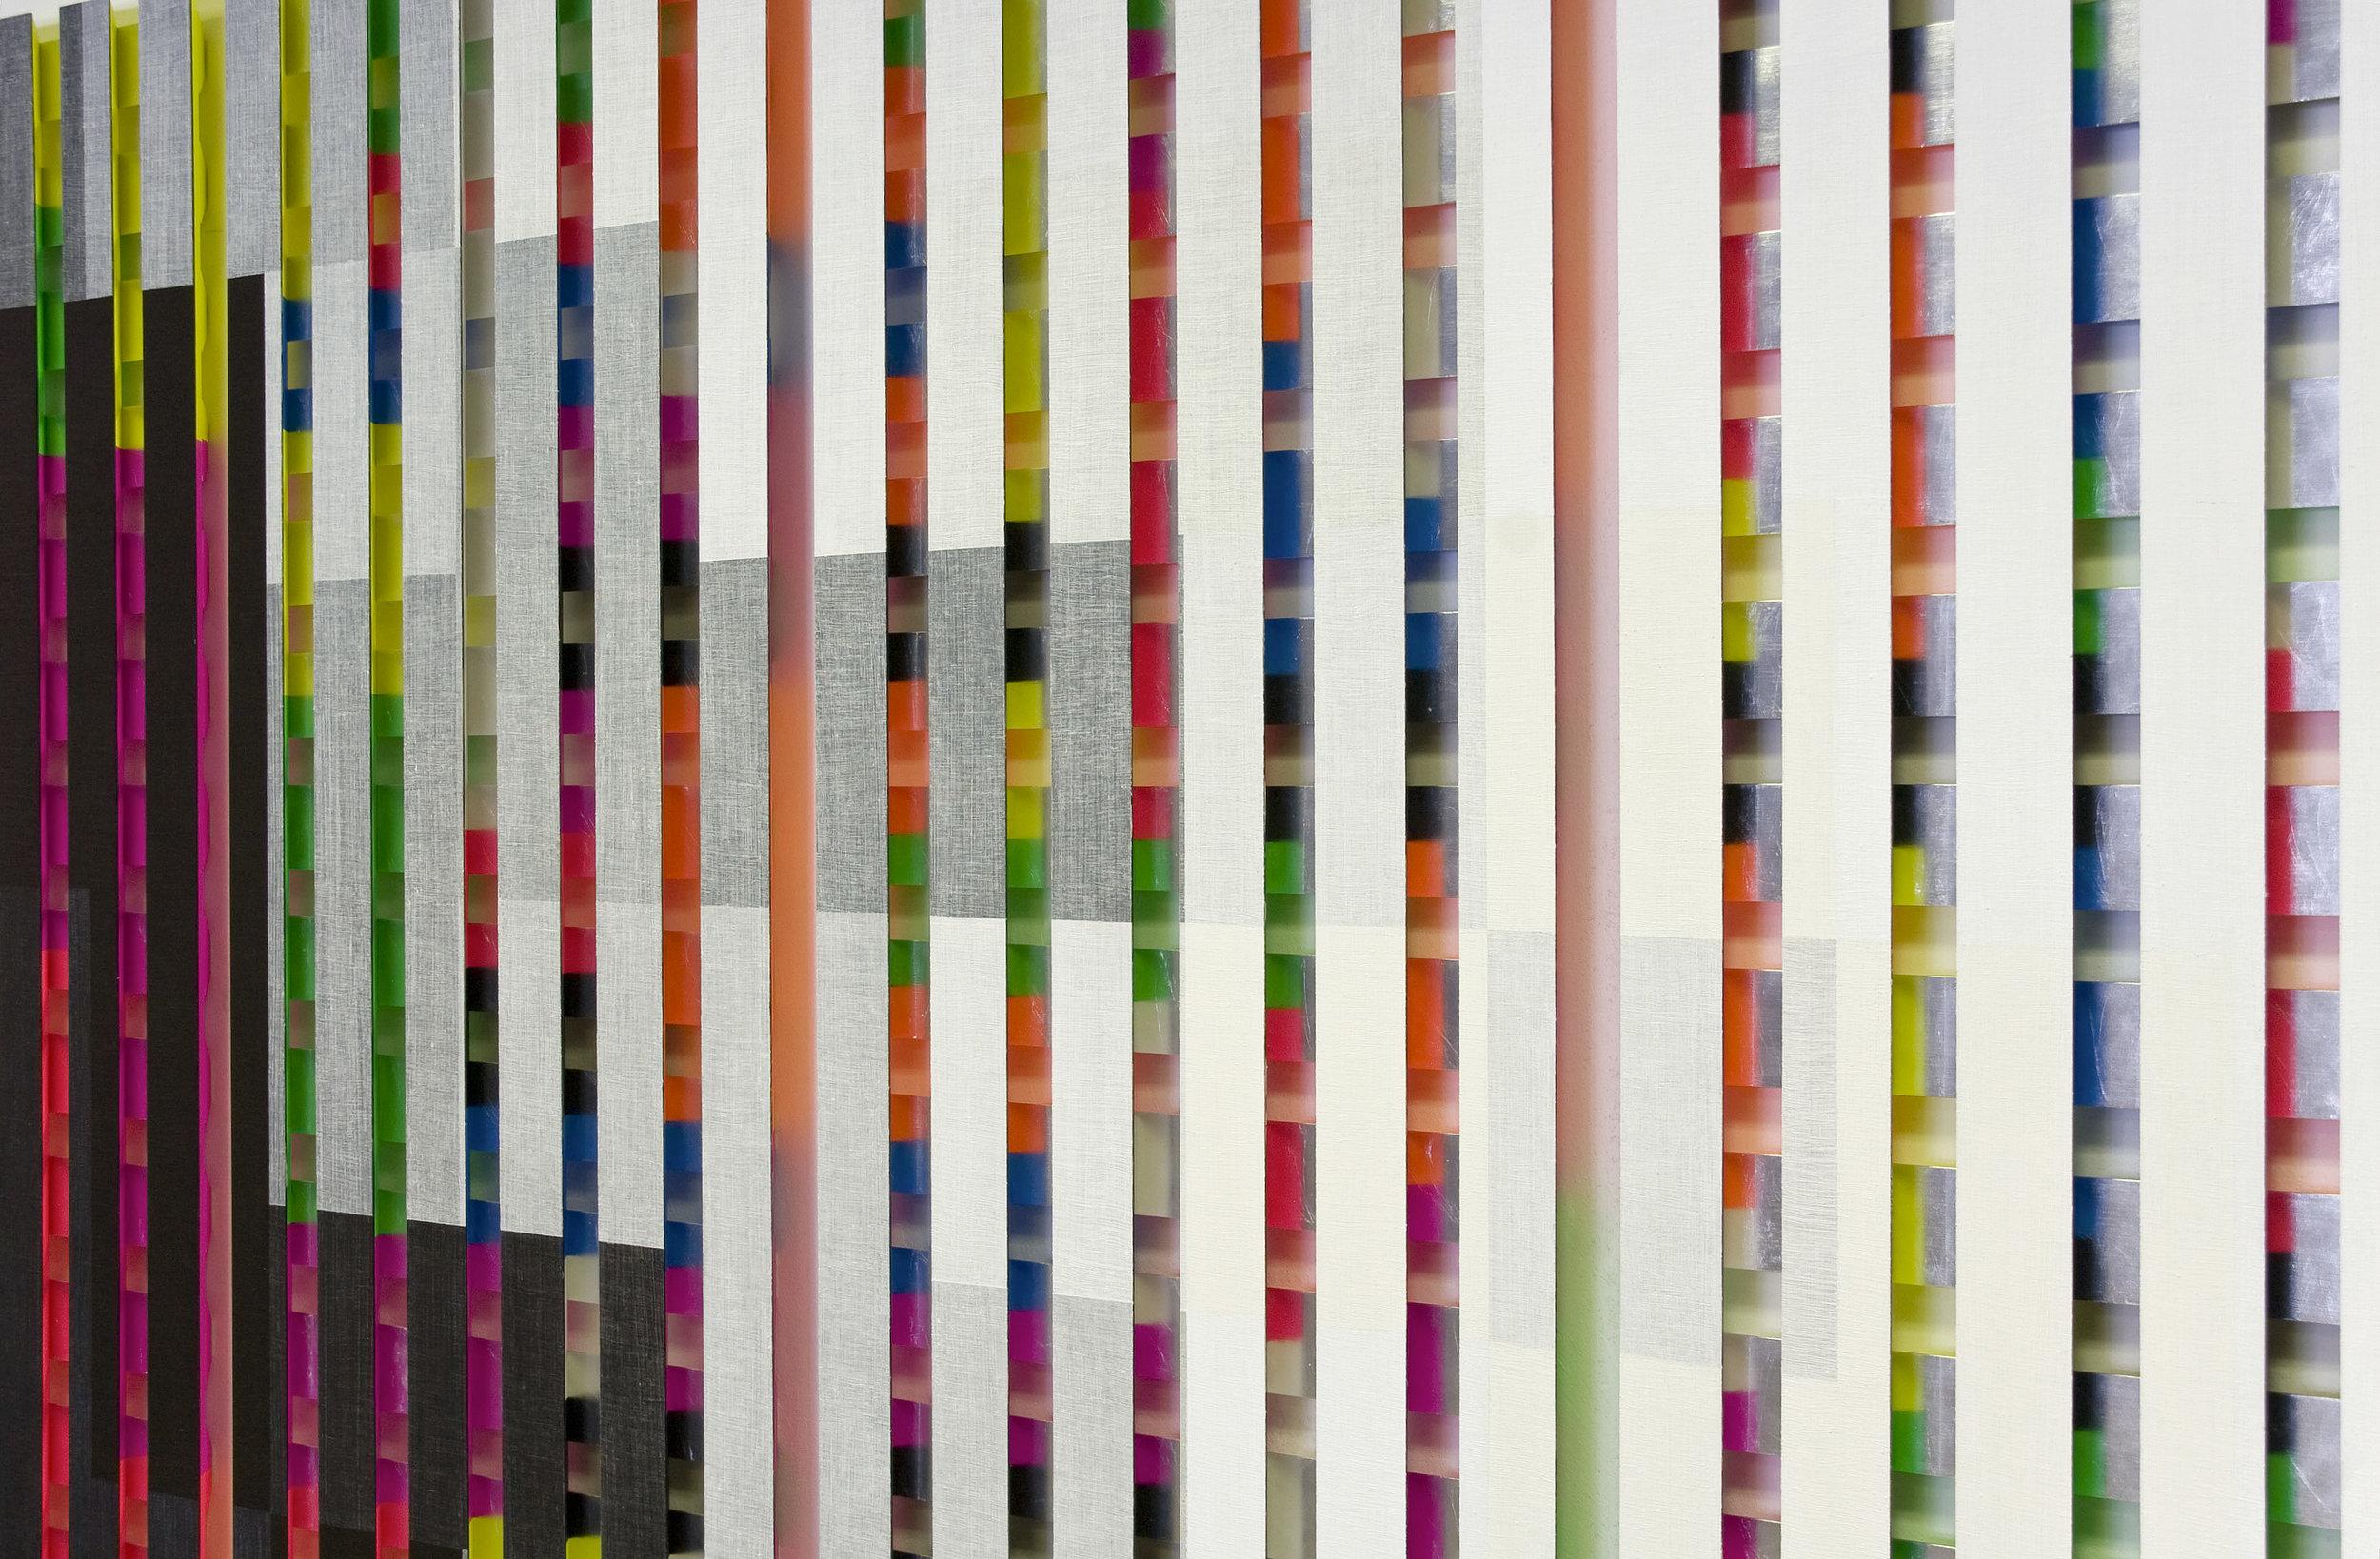 5l akril, les, 186 x 331 cm, 2010.jpg